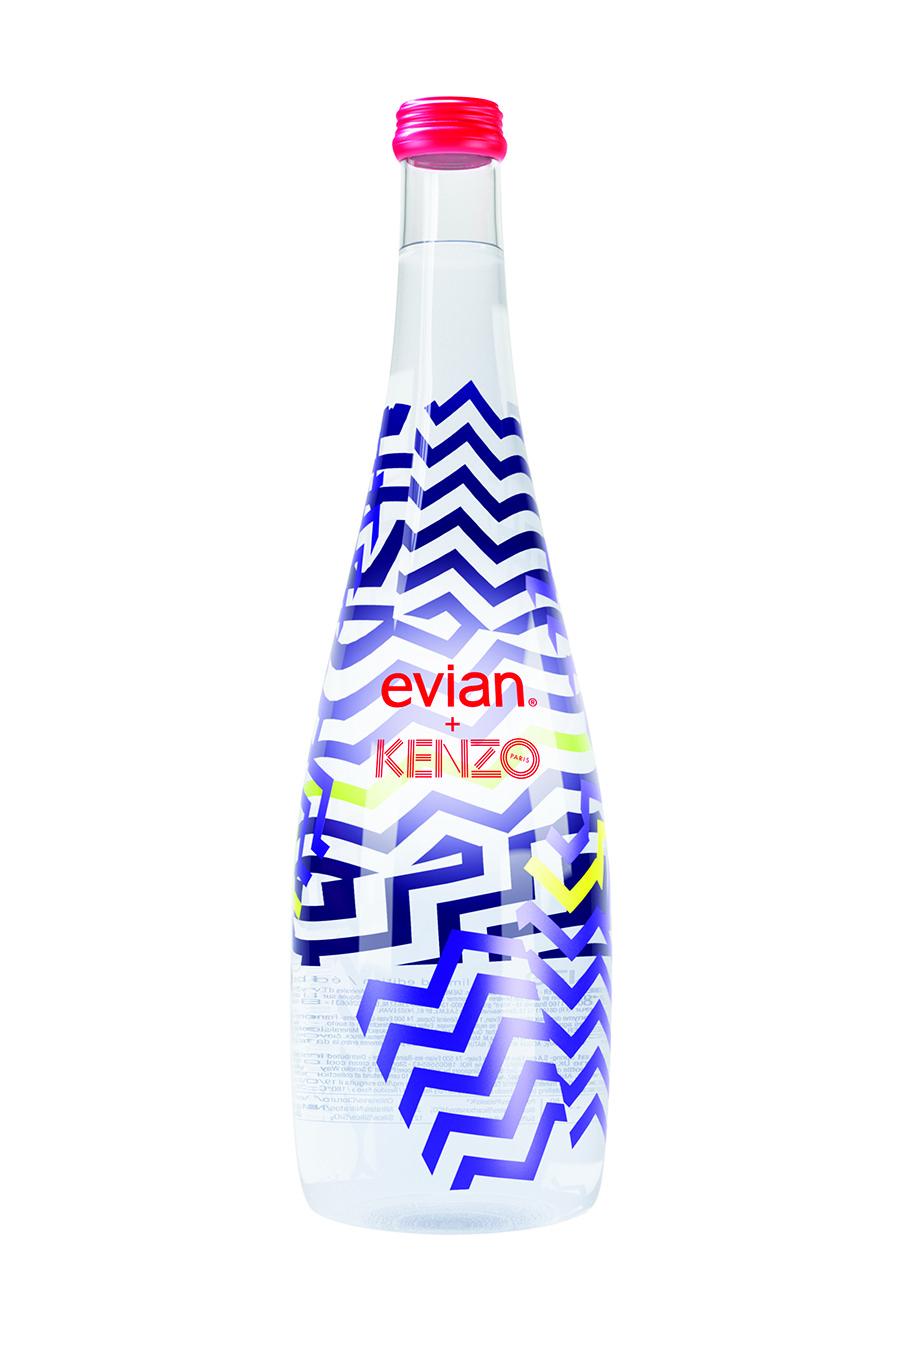 "evianR與KENZO攜手合作,推出evianR x KENZO 2015限量版紀念瓶,以""玩心未泯""主題詮釋共同品牌精神。"